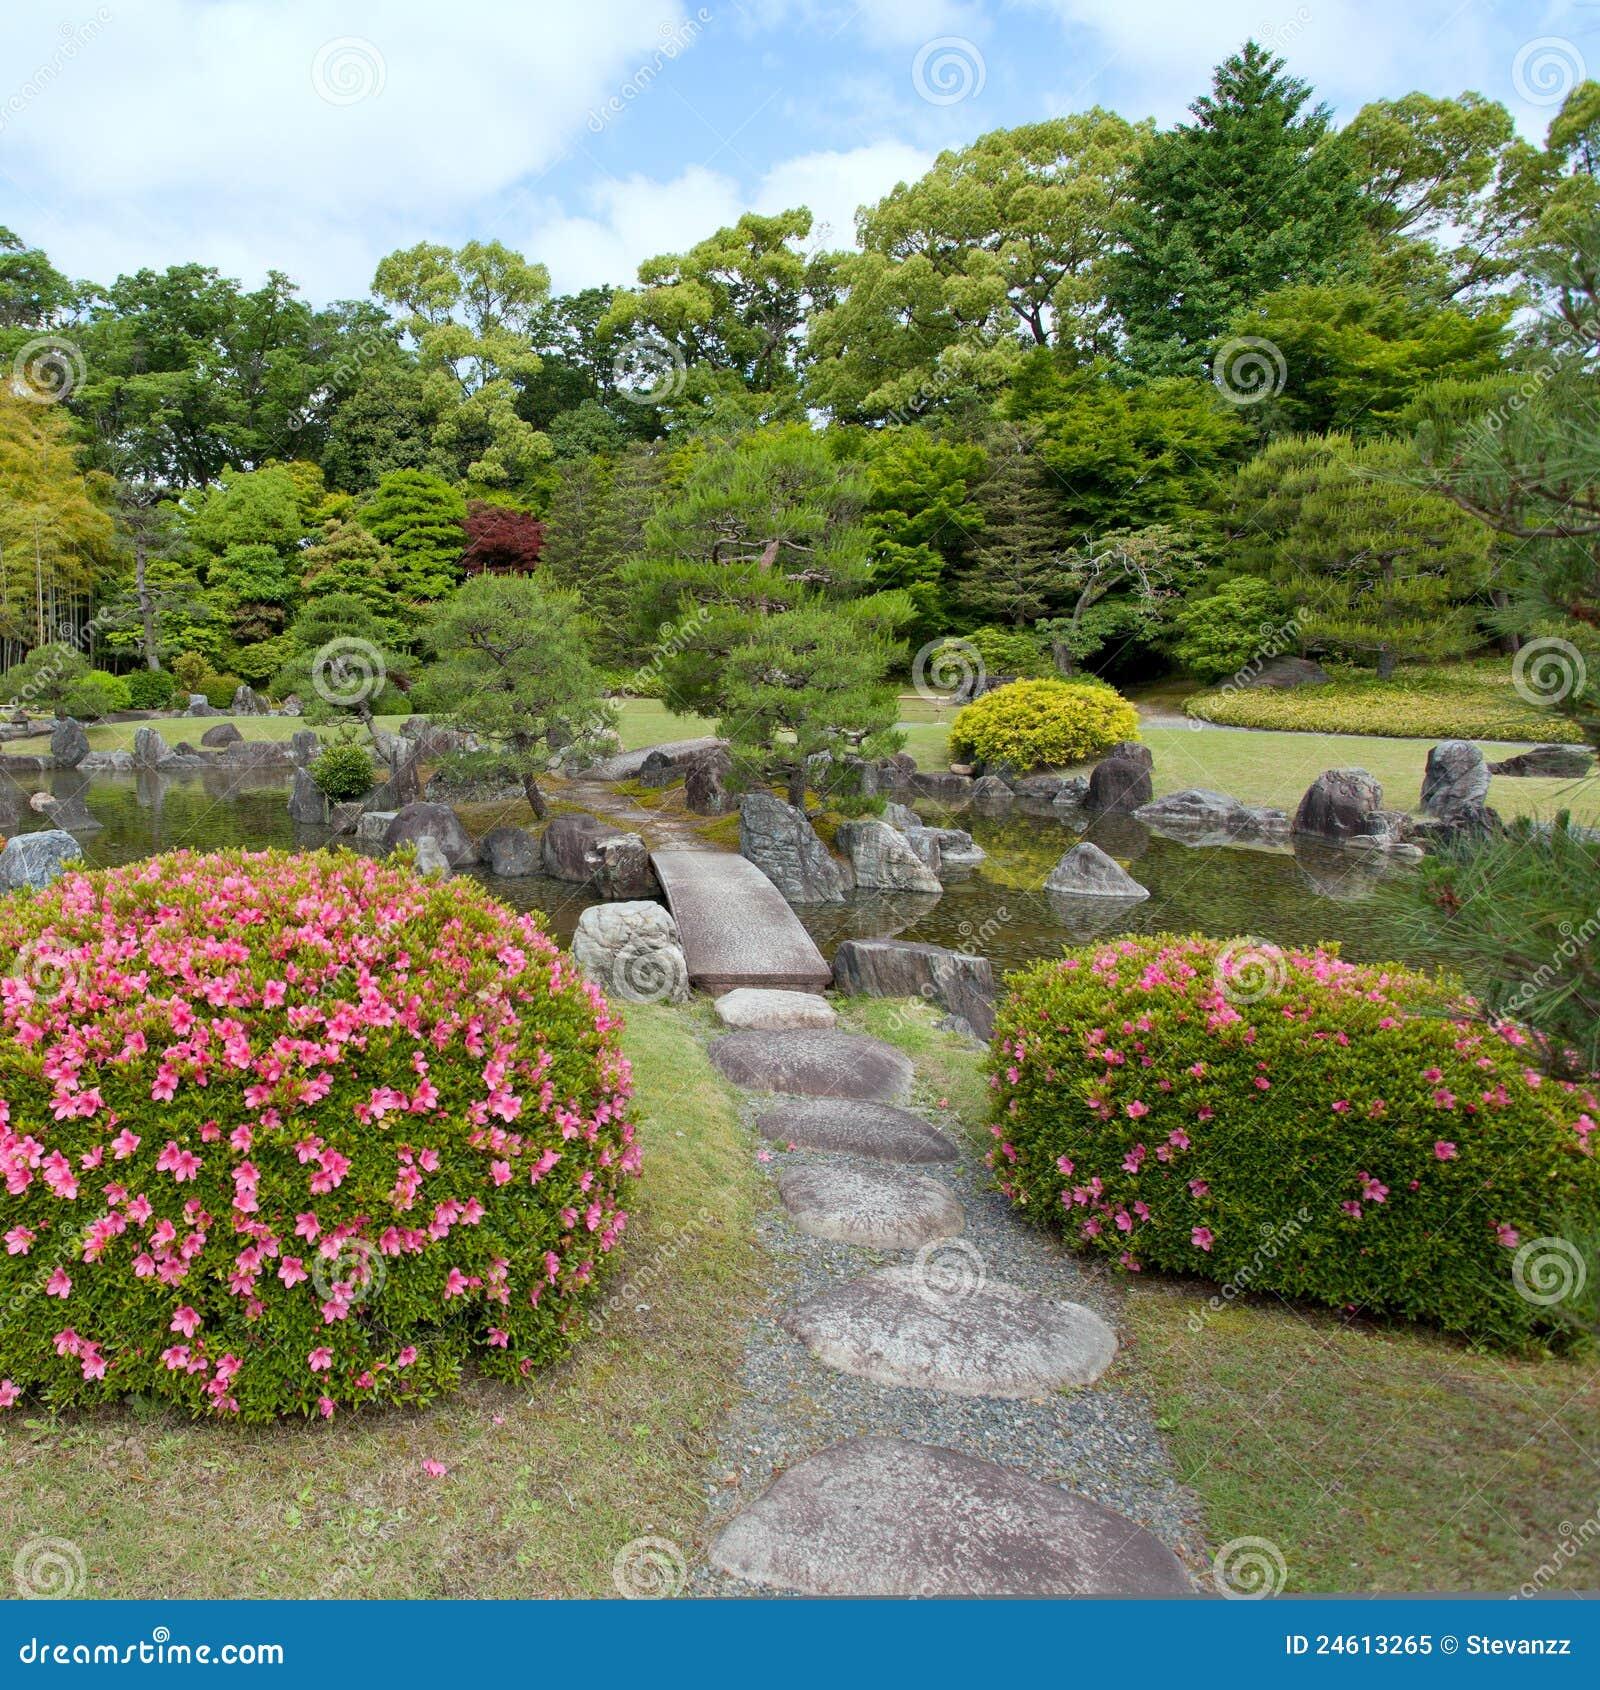 Zen Garden With Bridge Plants Rocks And Pond Royalty